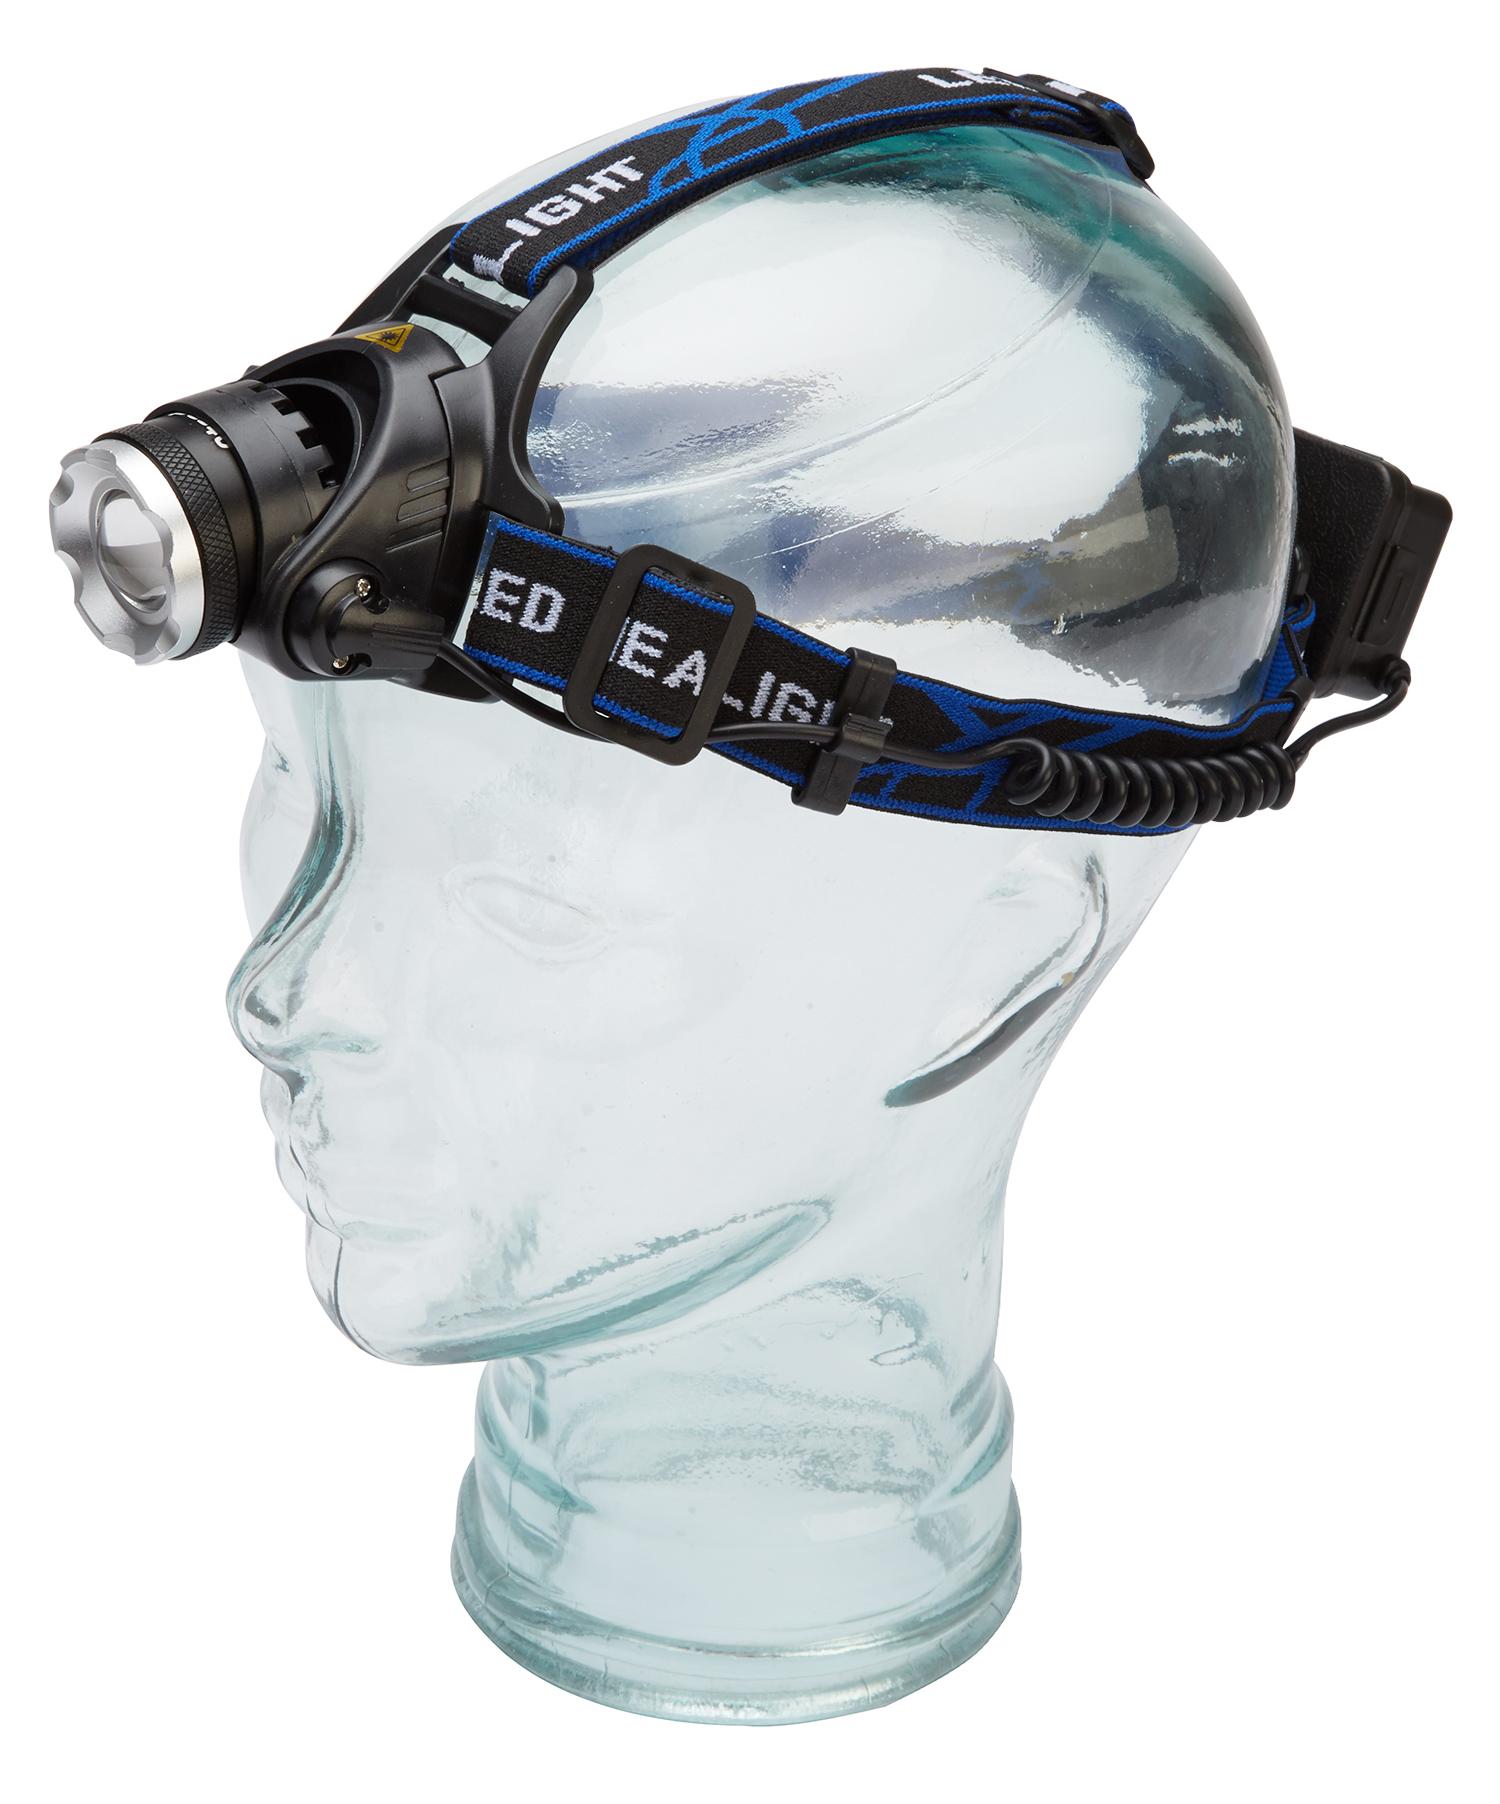 Atredo - Pandelampe - 600-800 lumen - Opladelig - Aluminium - Sort   Headlamp